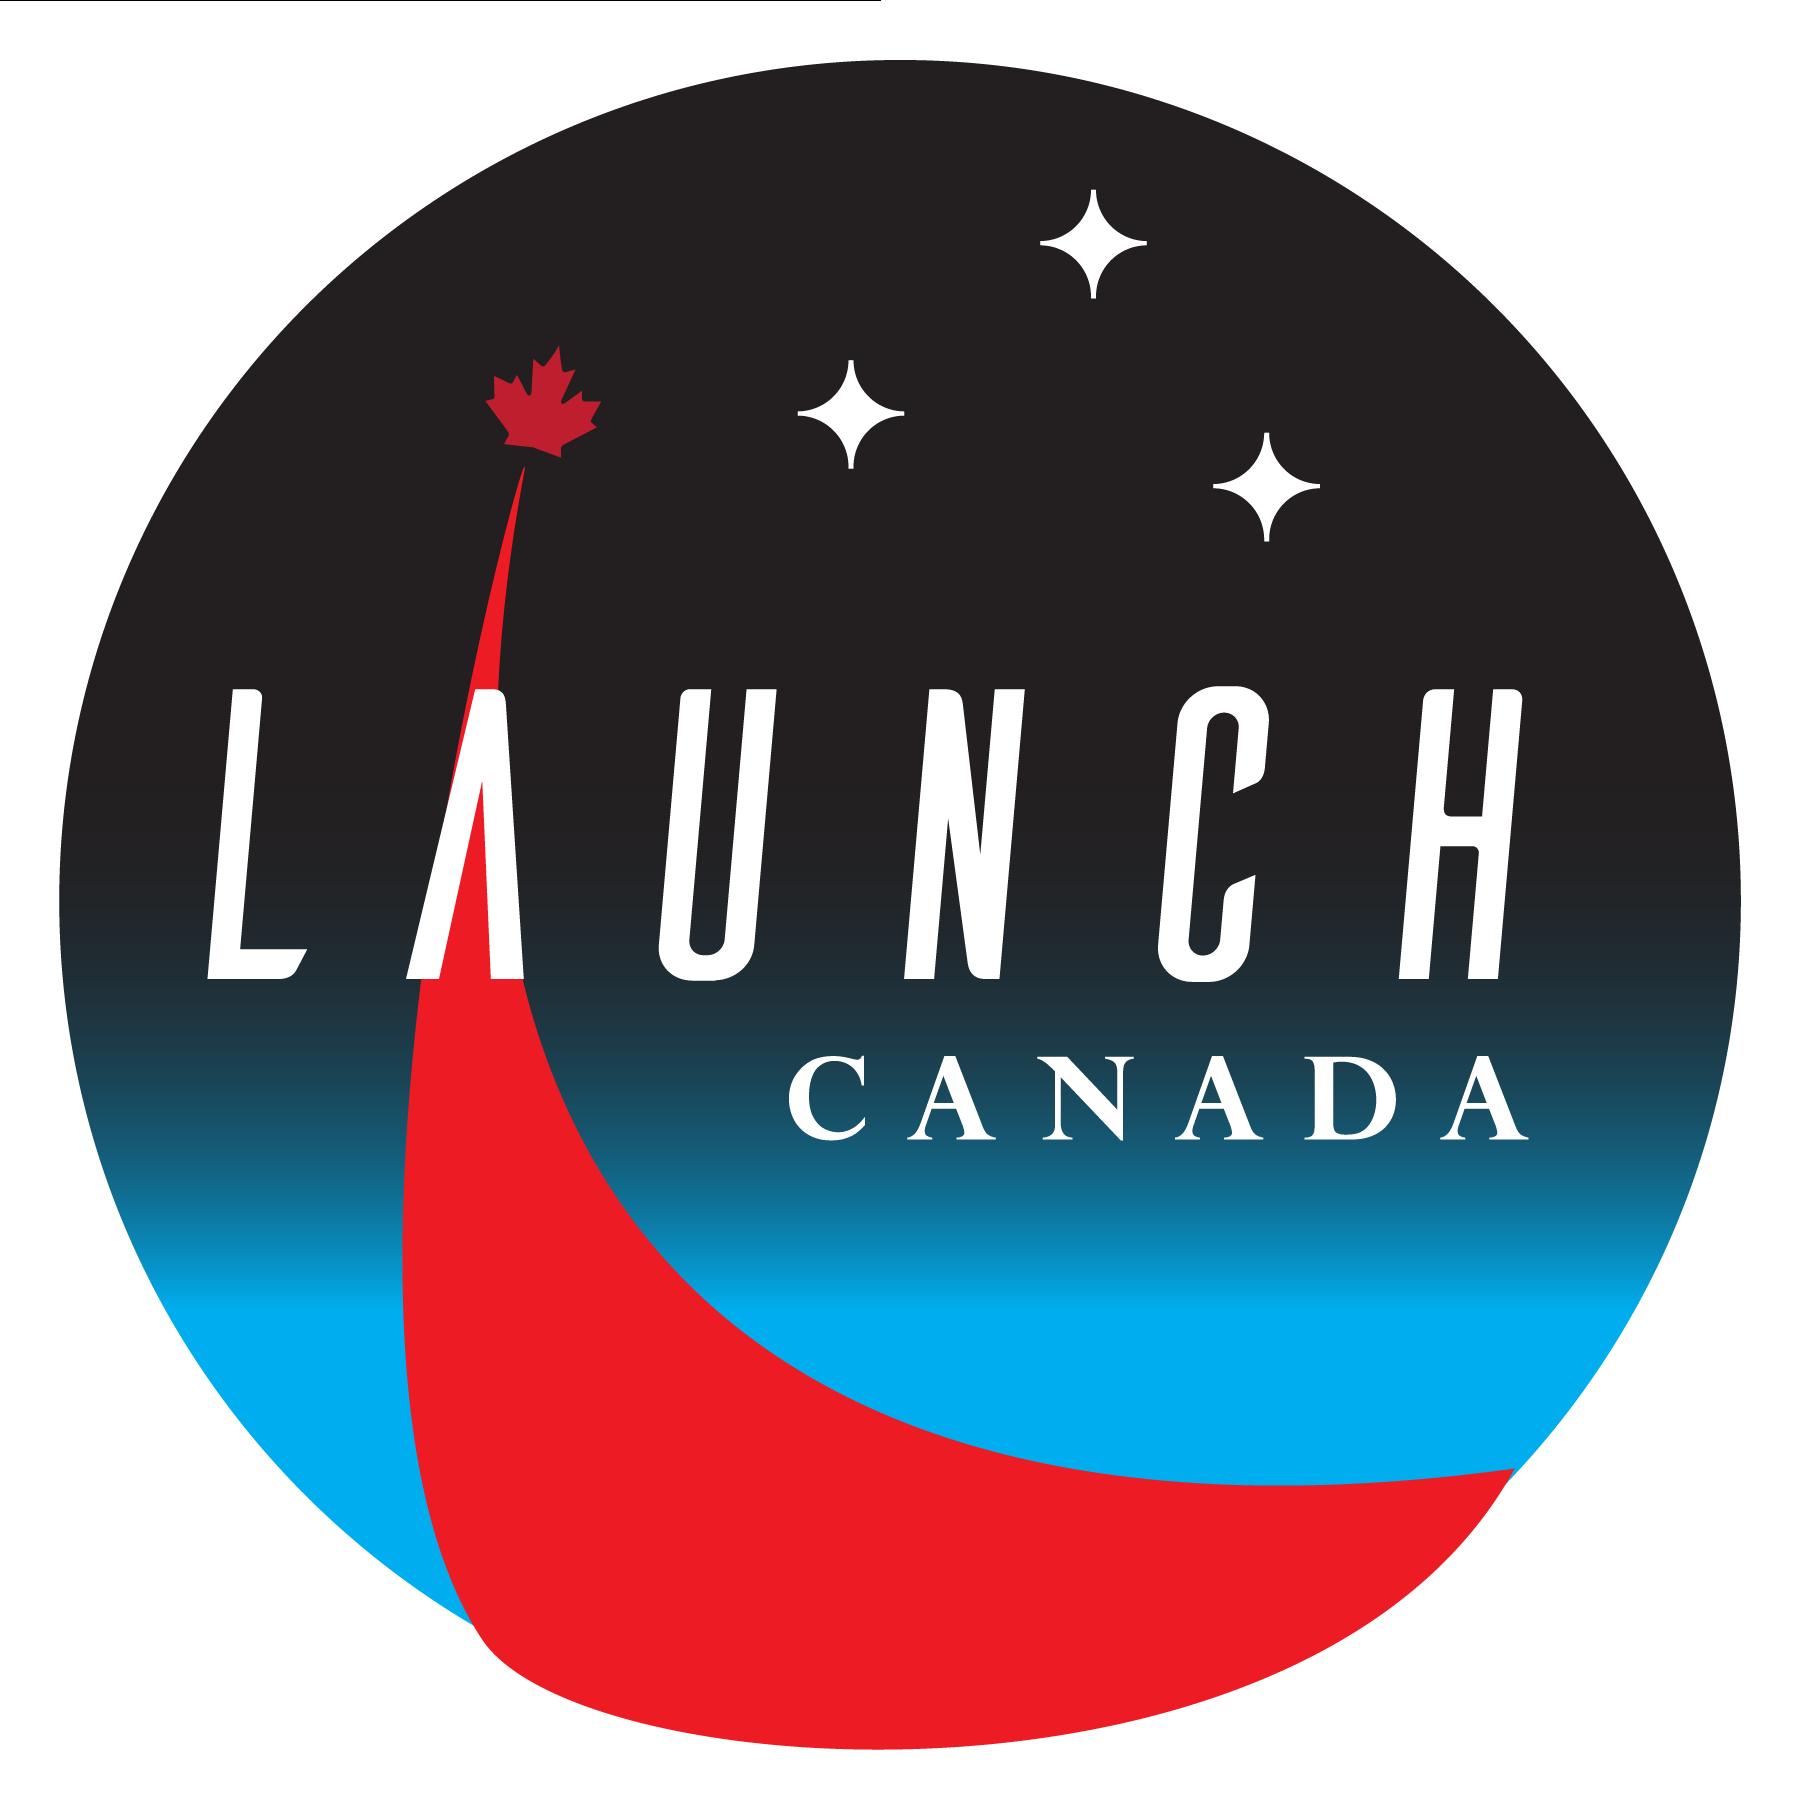 Launch Canada